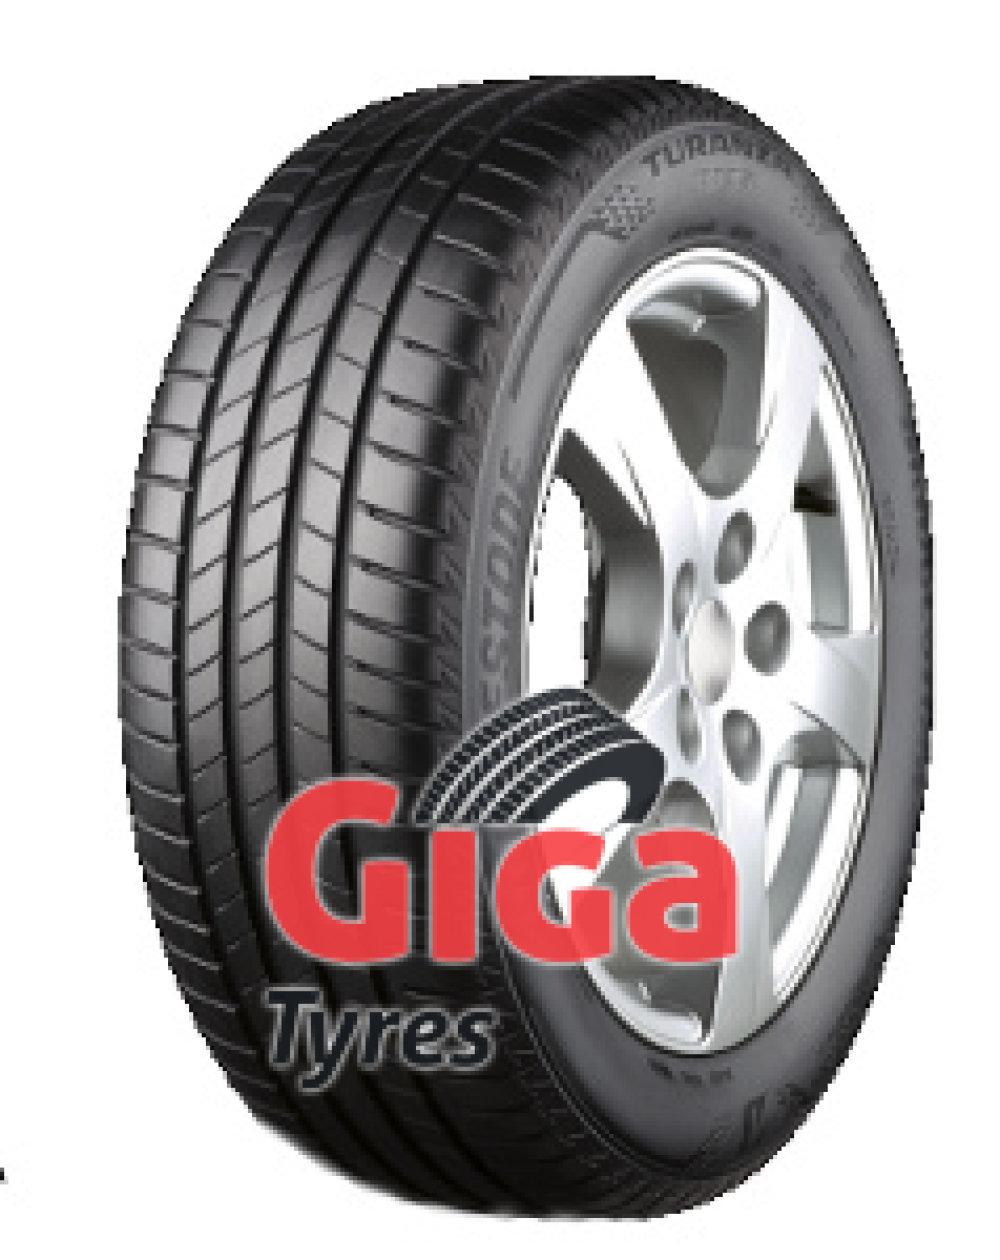 Bridgestone Turanza T005 ( 205/45 R16 87W XL with rim protection (MFS) )